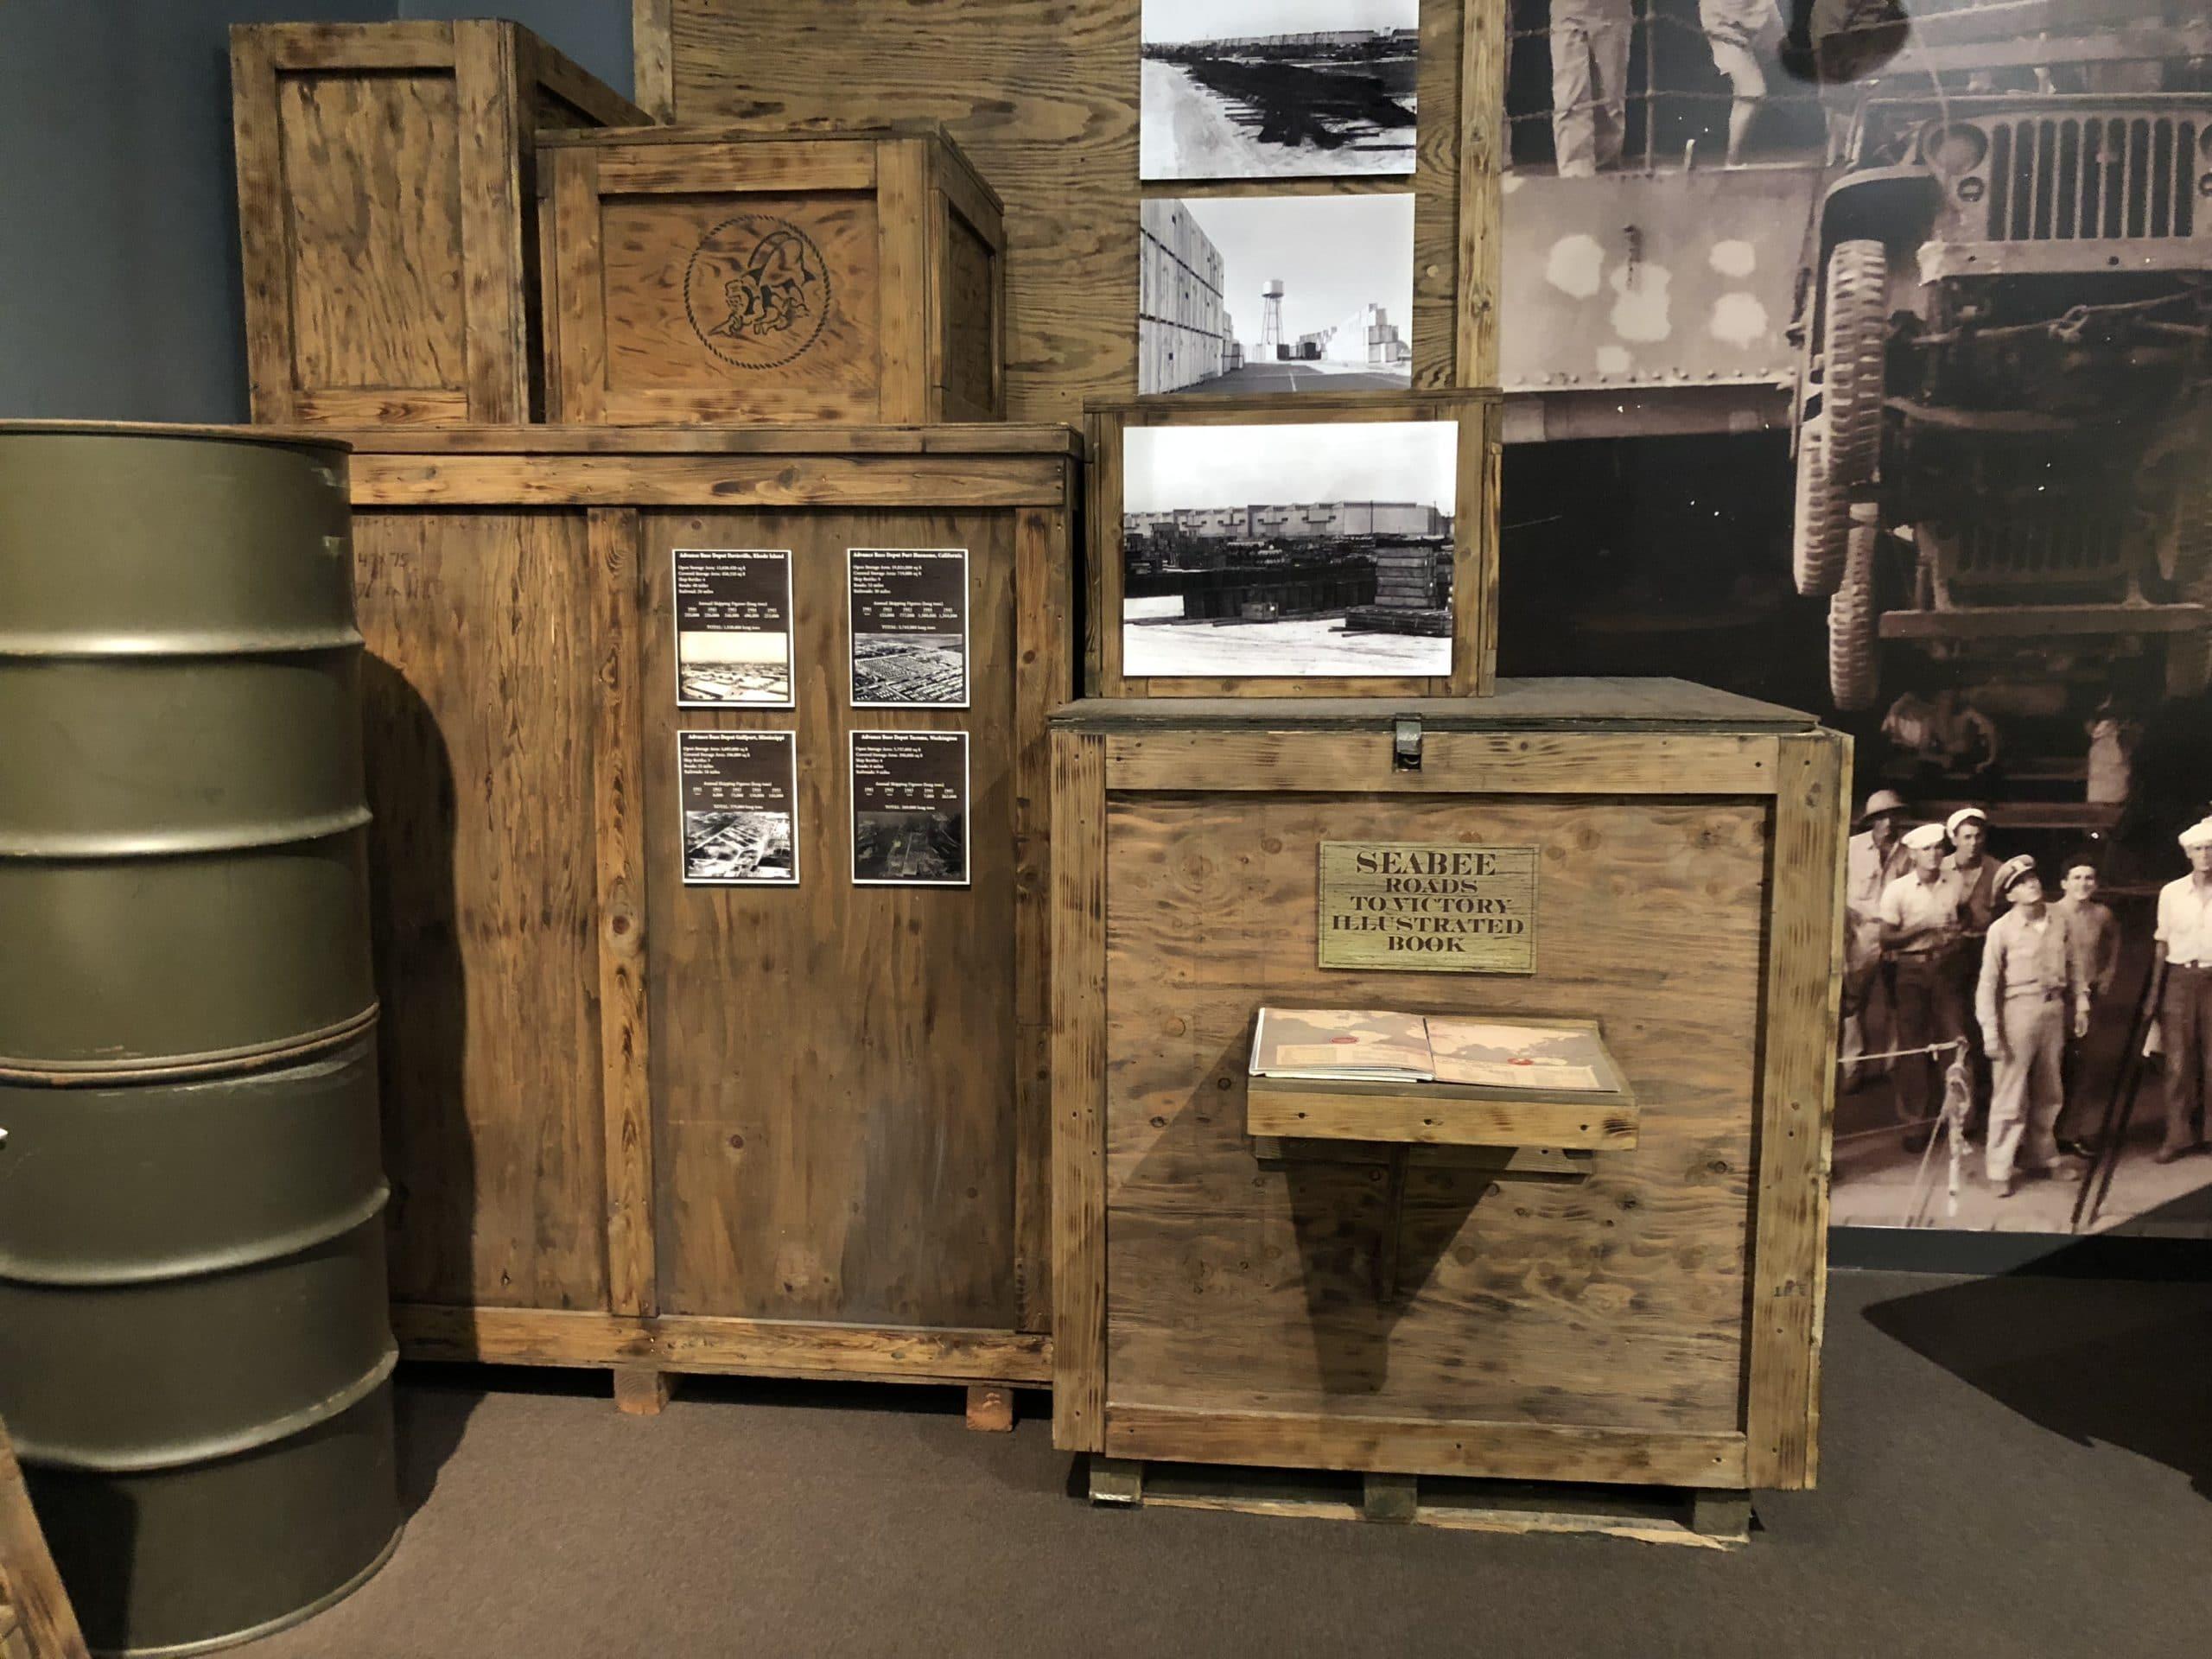 seabea seebee museum crates